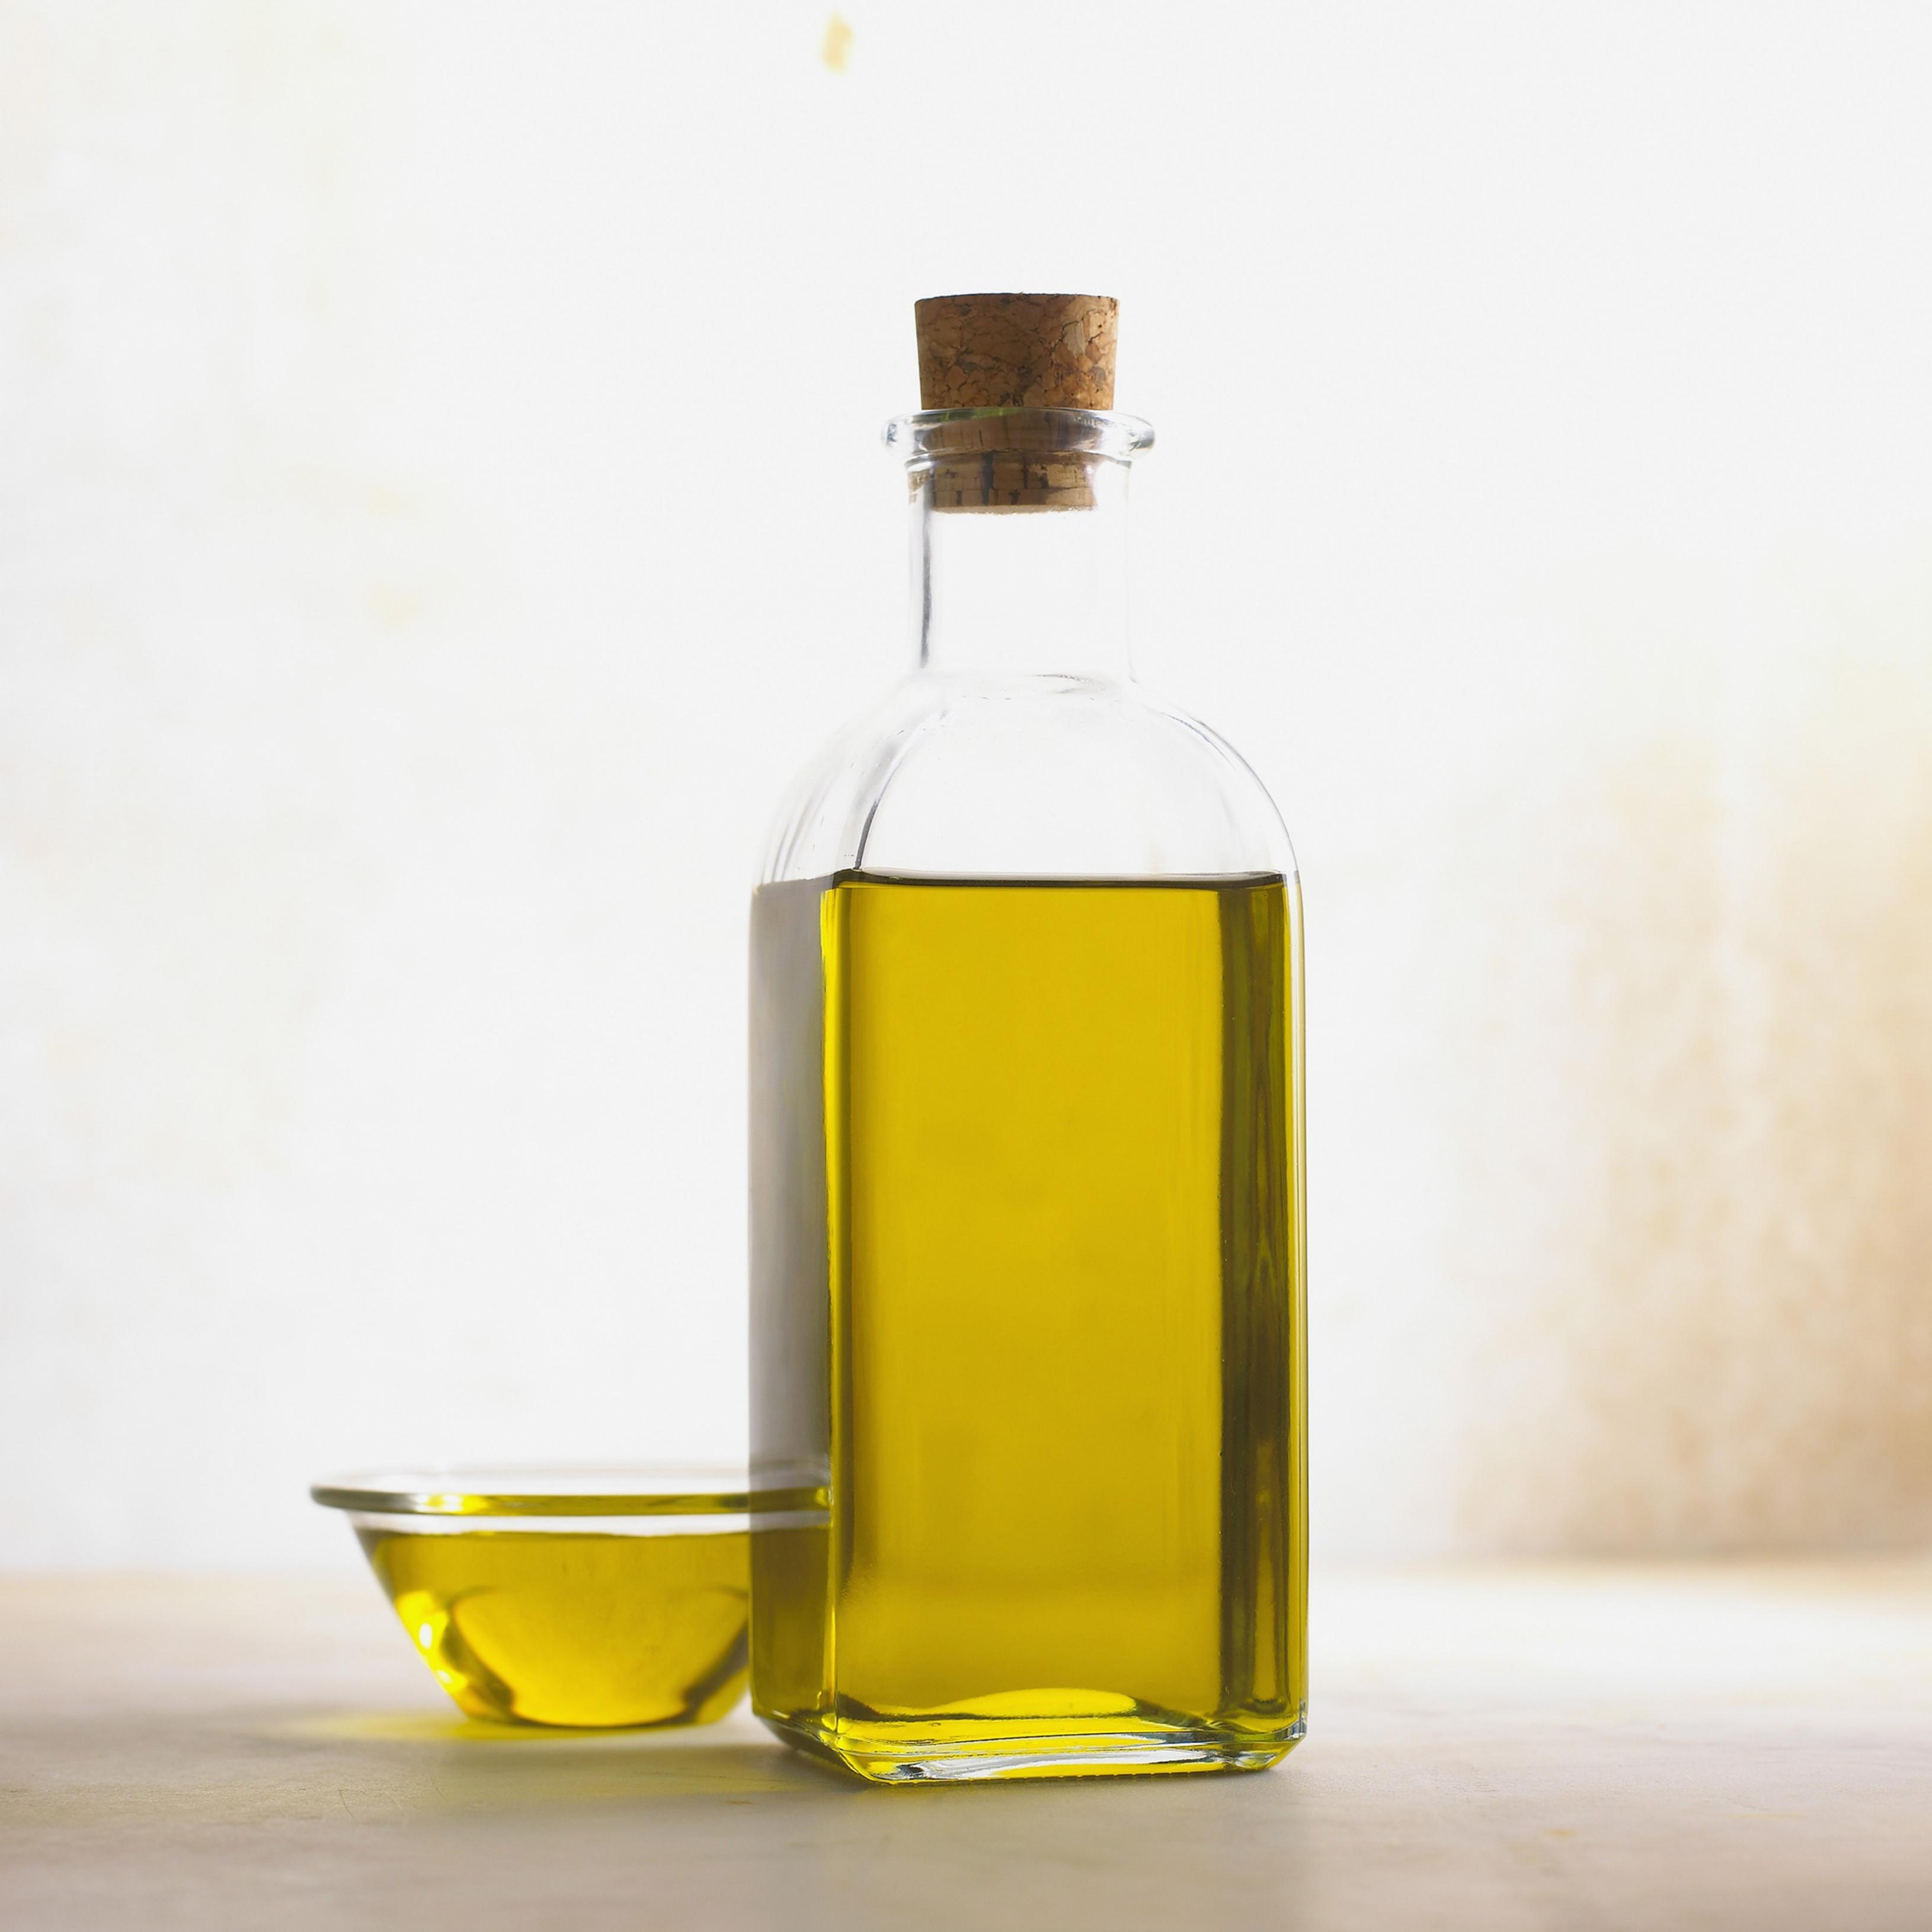 Spiritual Session/Prayer Oil